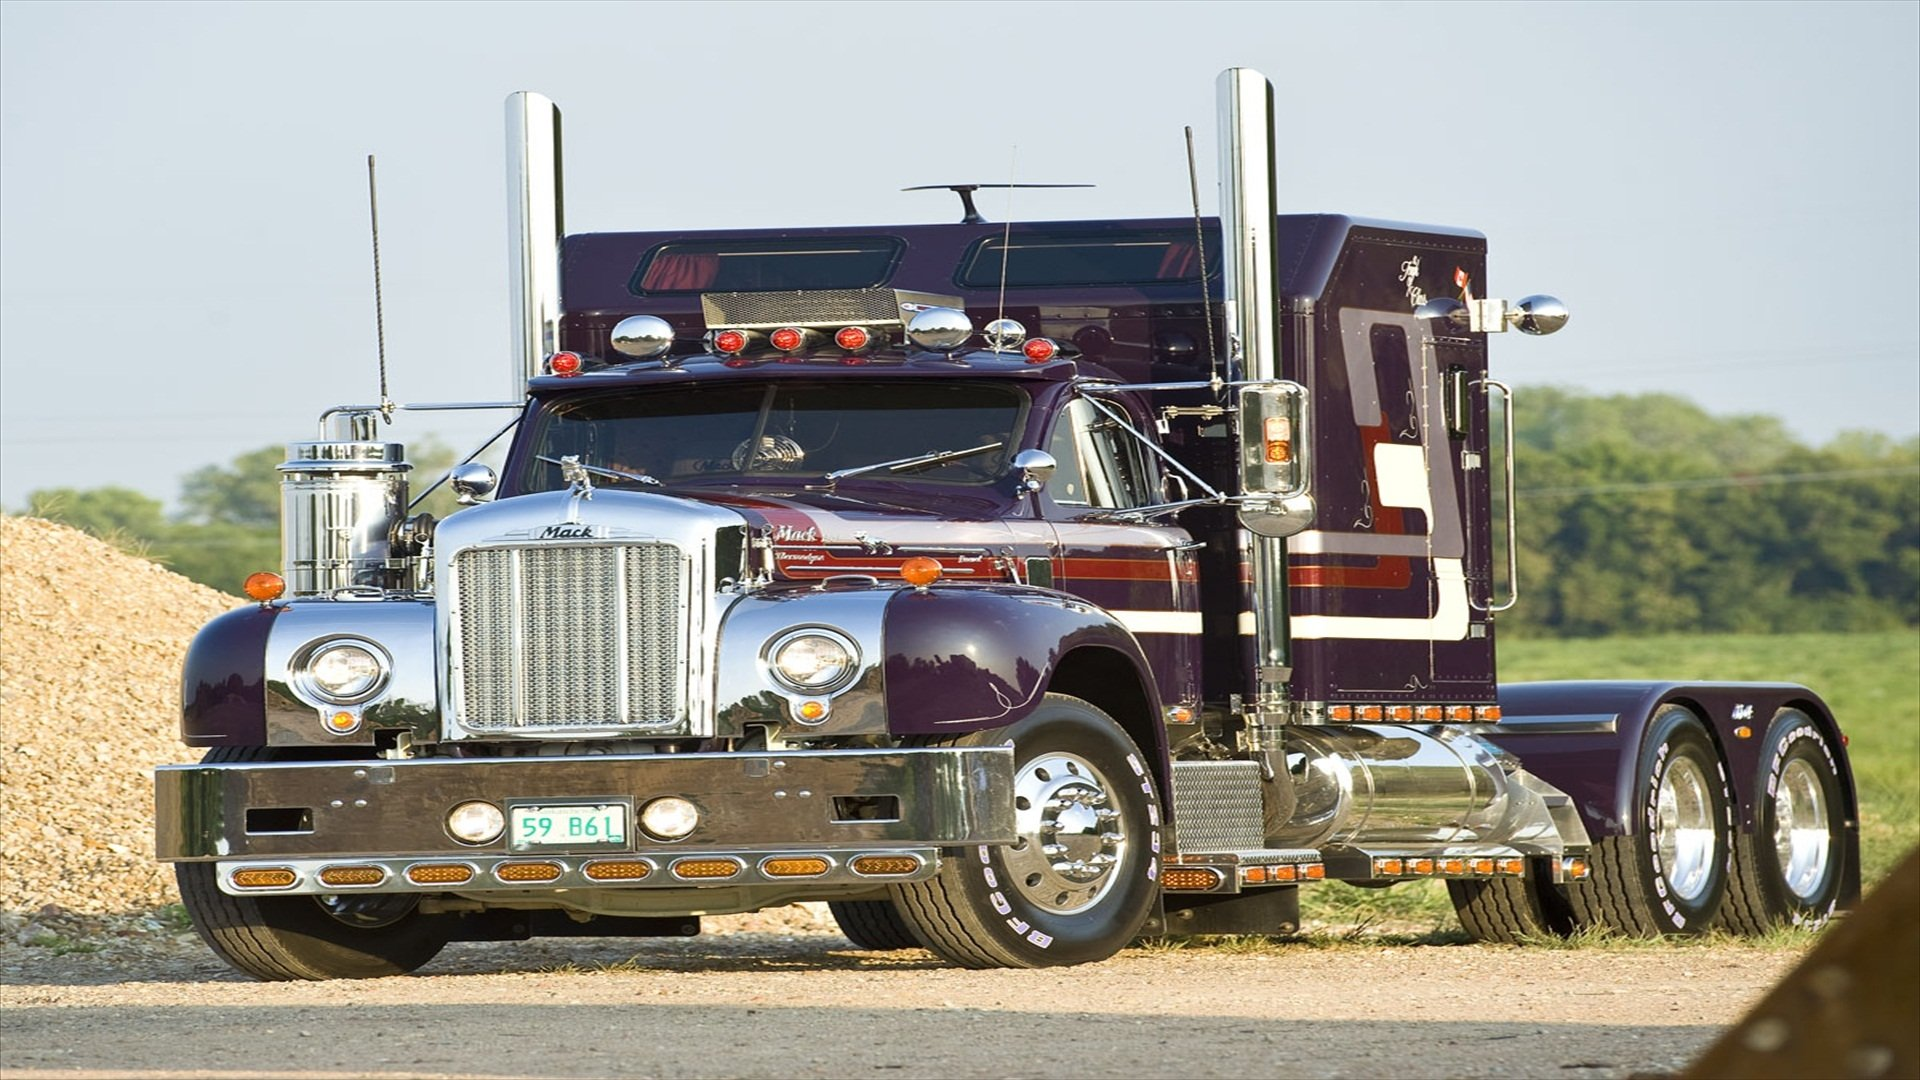 Mack Trucks Full Hd Wallpaper And Background Image